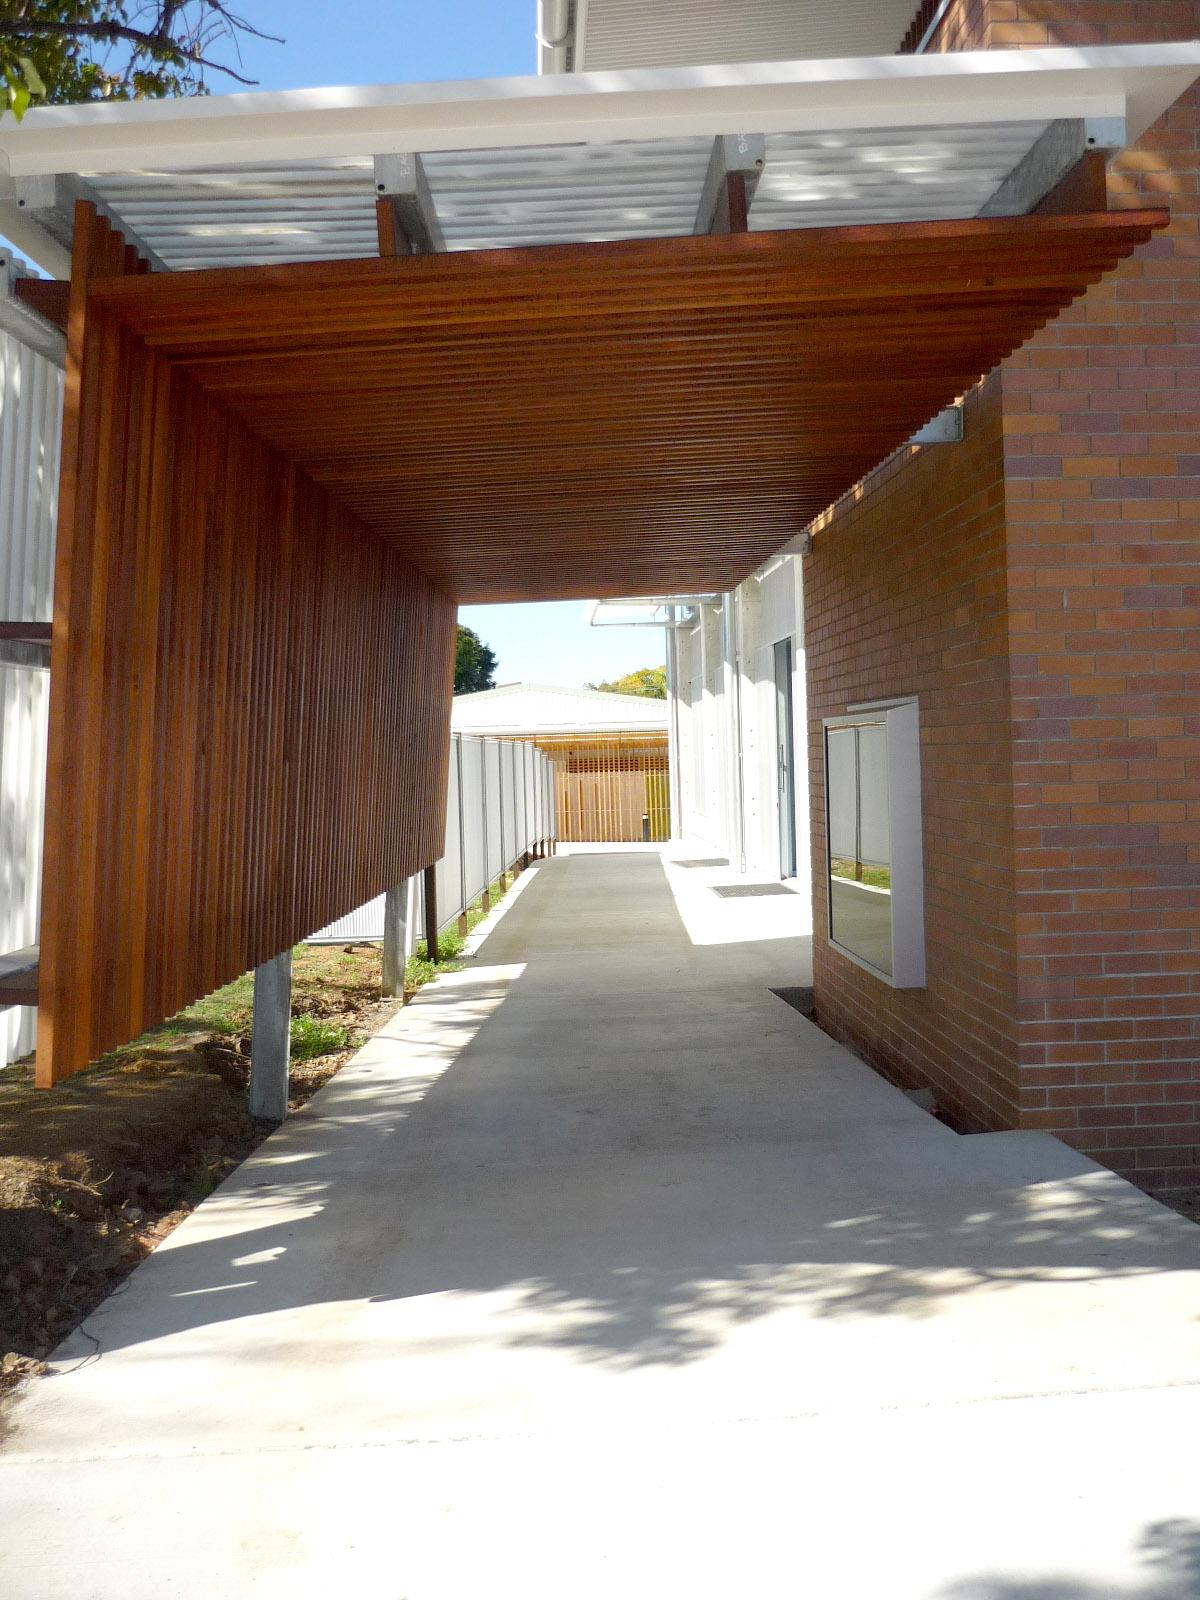 All Saints Primary School- Regional Commendation